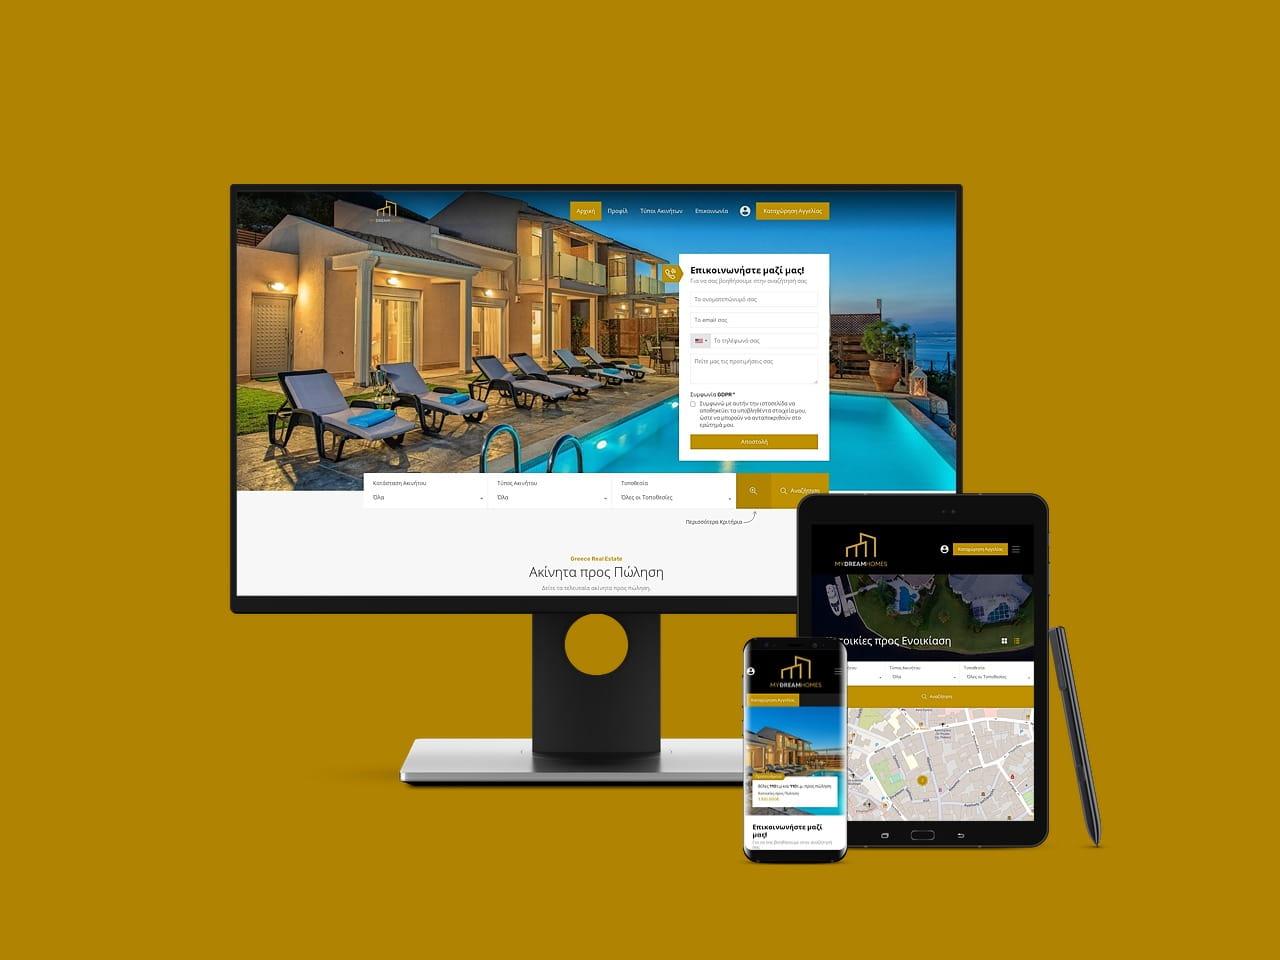 My Dream Homes Lefkada Real Estate Καταχώρηση Αγγελίας & Ακινήτων